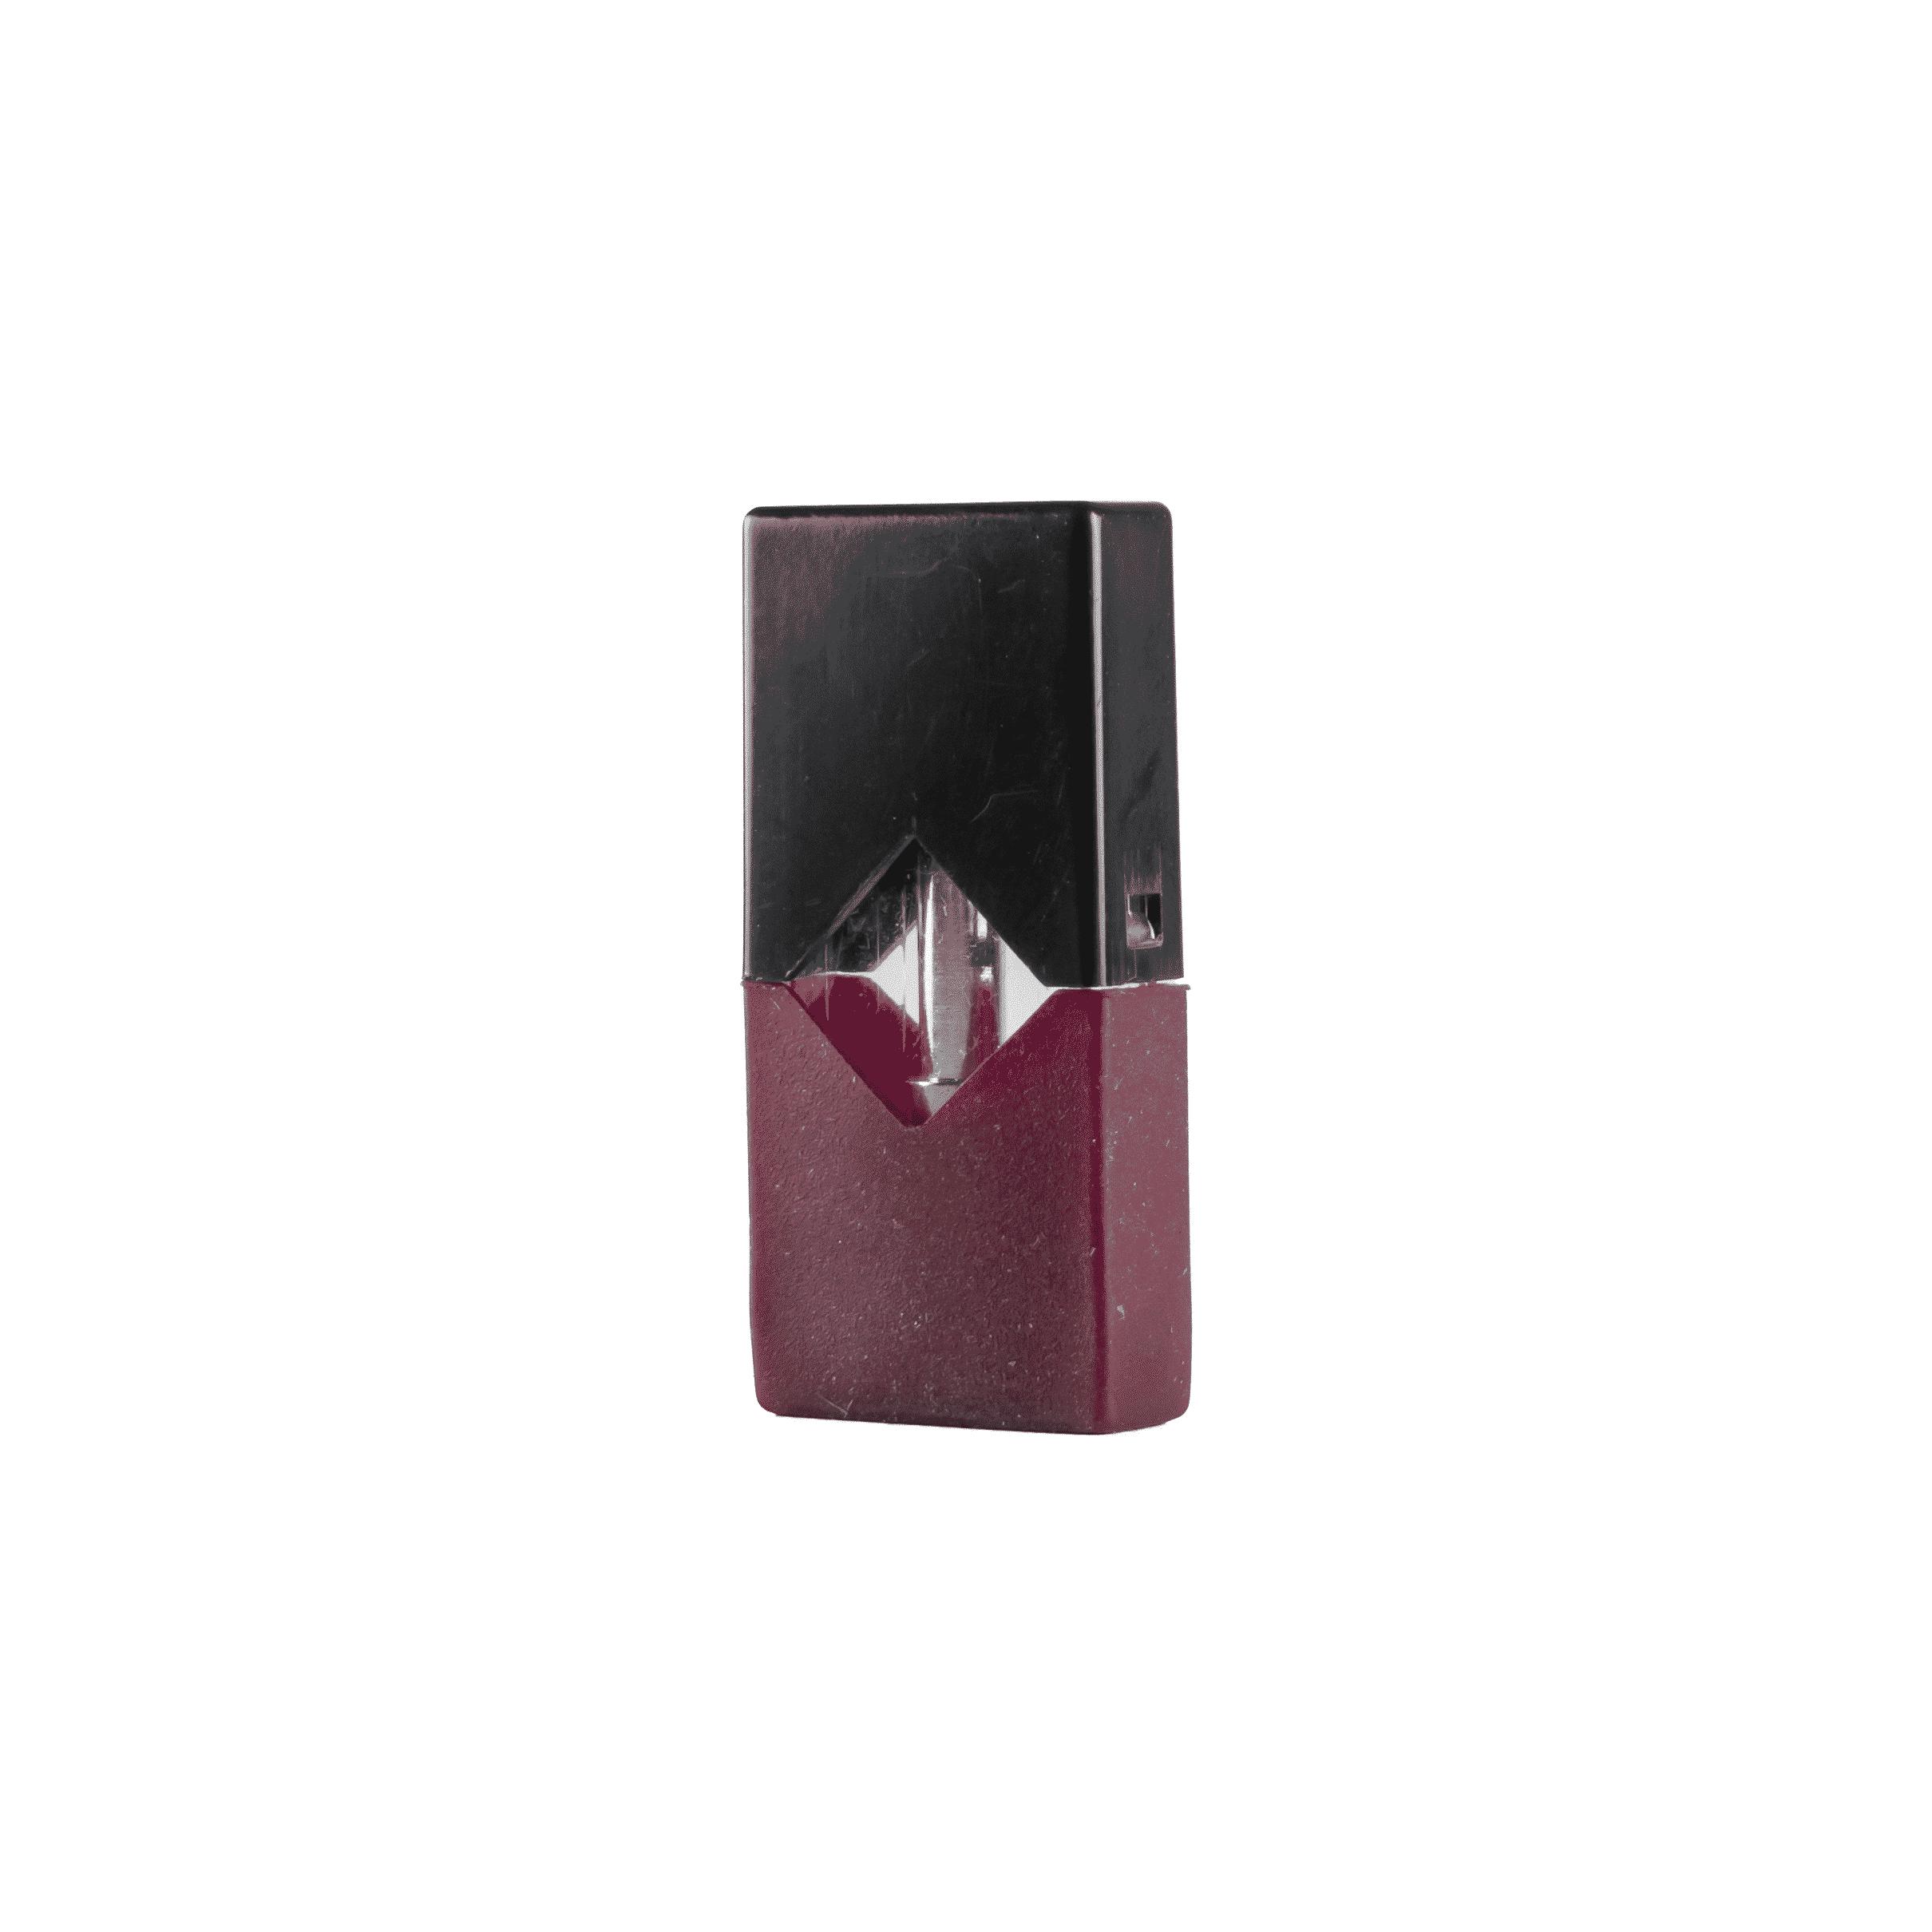 Refillable Juul Compatible Vape Pods 1ml (100 pcs) | Bulk Wholesale  Marijuana Packaging, Vape Cartridges, Joint Tubes, Custom Labels, and More!